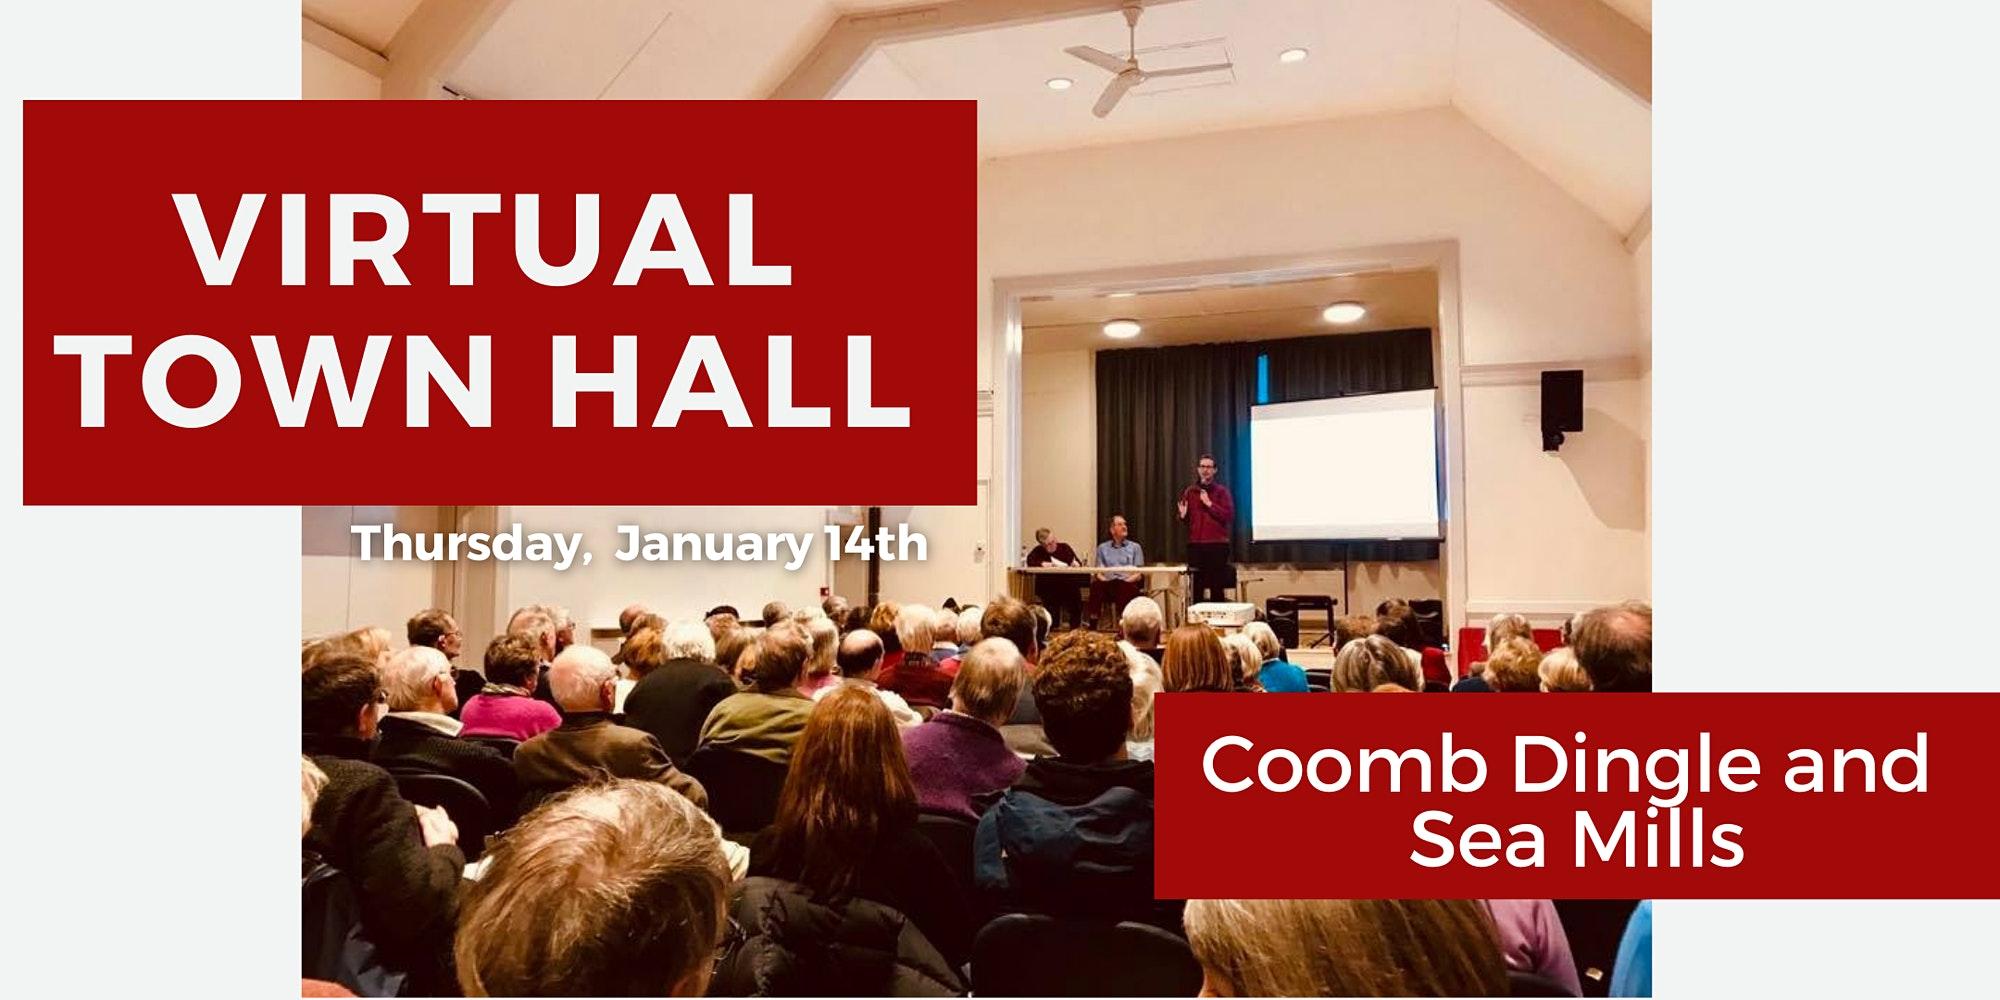 Virtual Town Hall: Coombe Dingle & Sea Mills